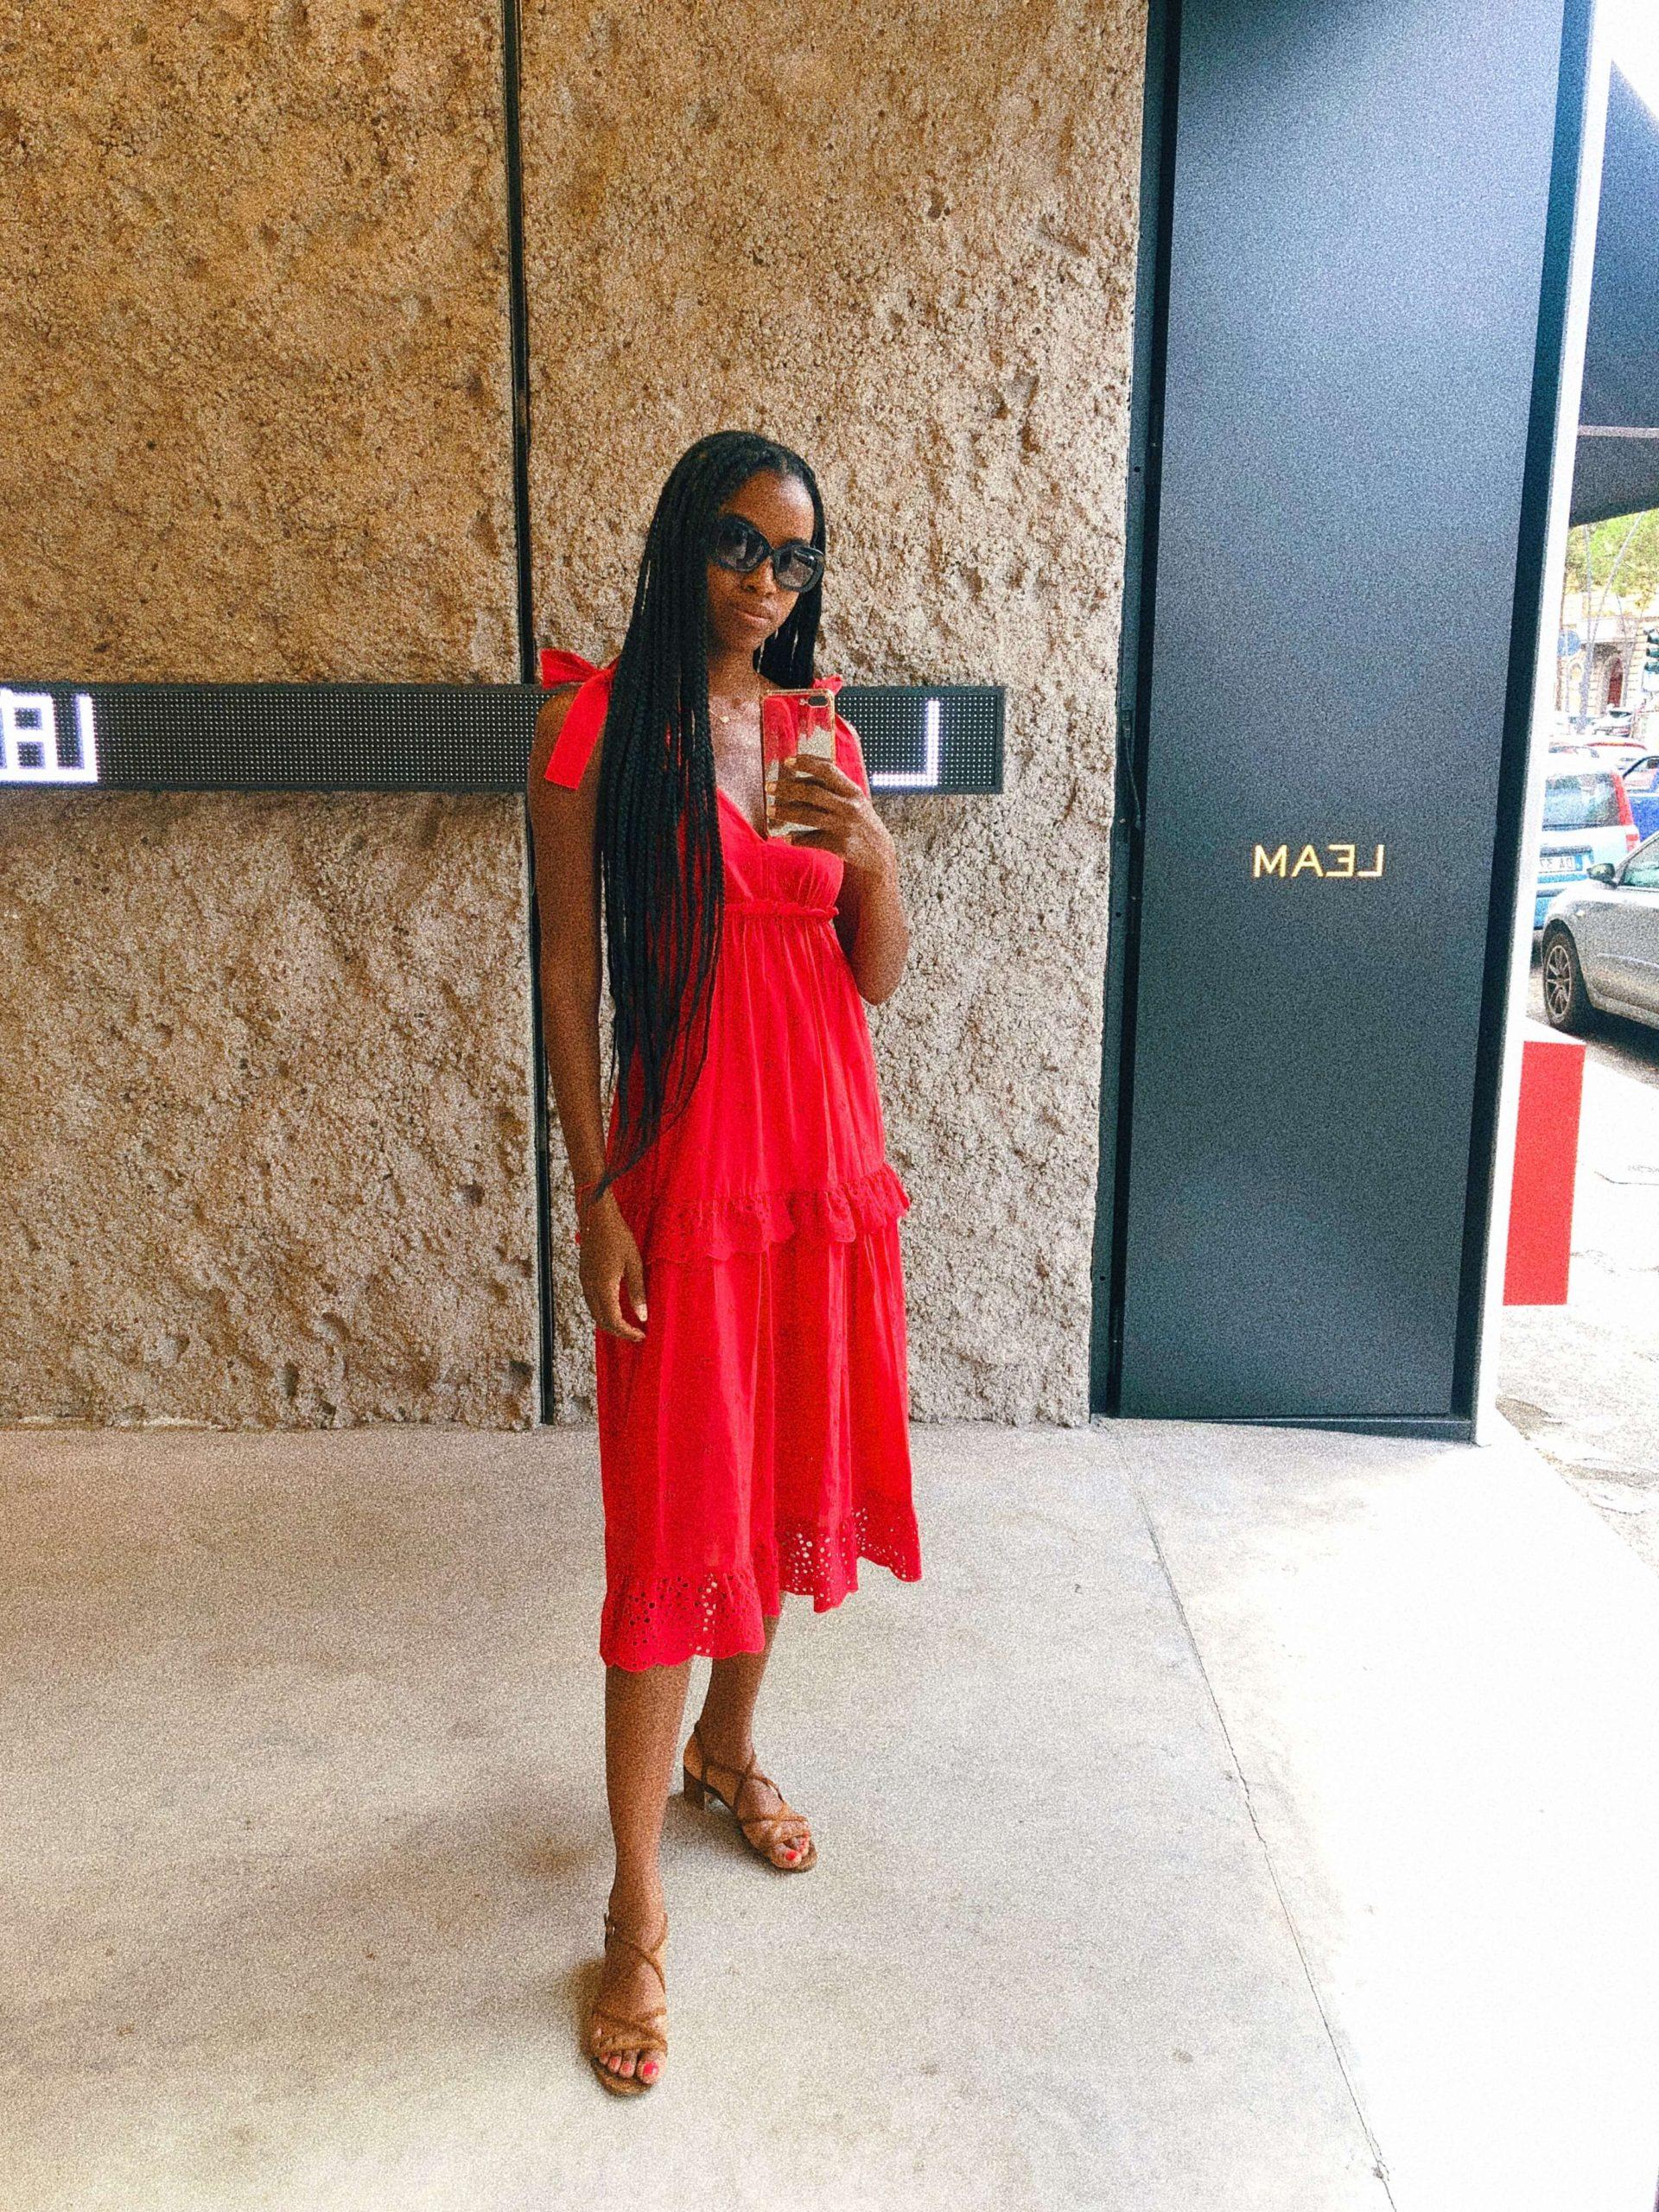 traveling alone as black woman